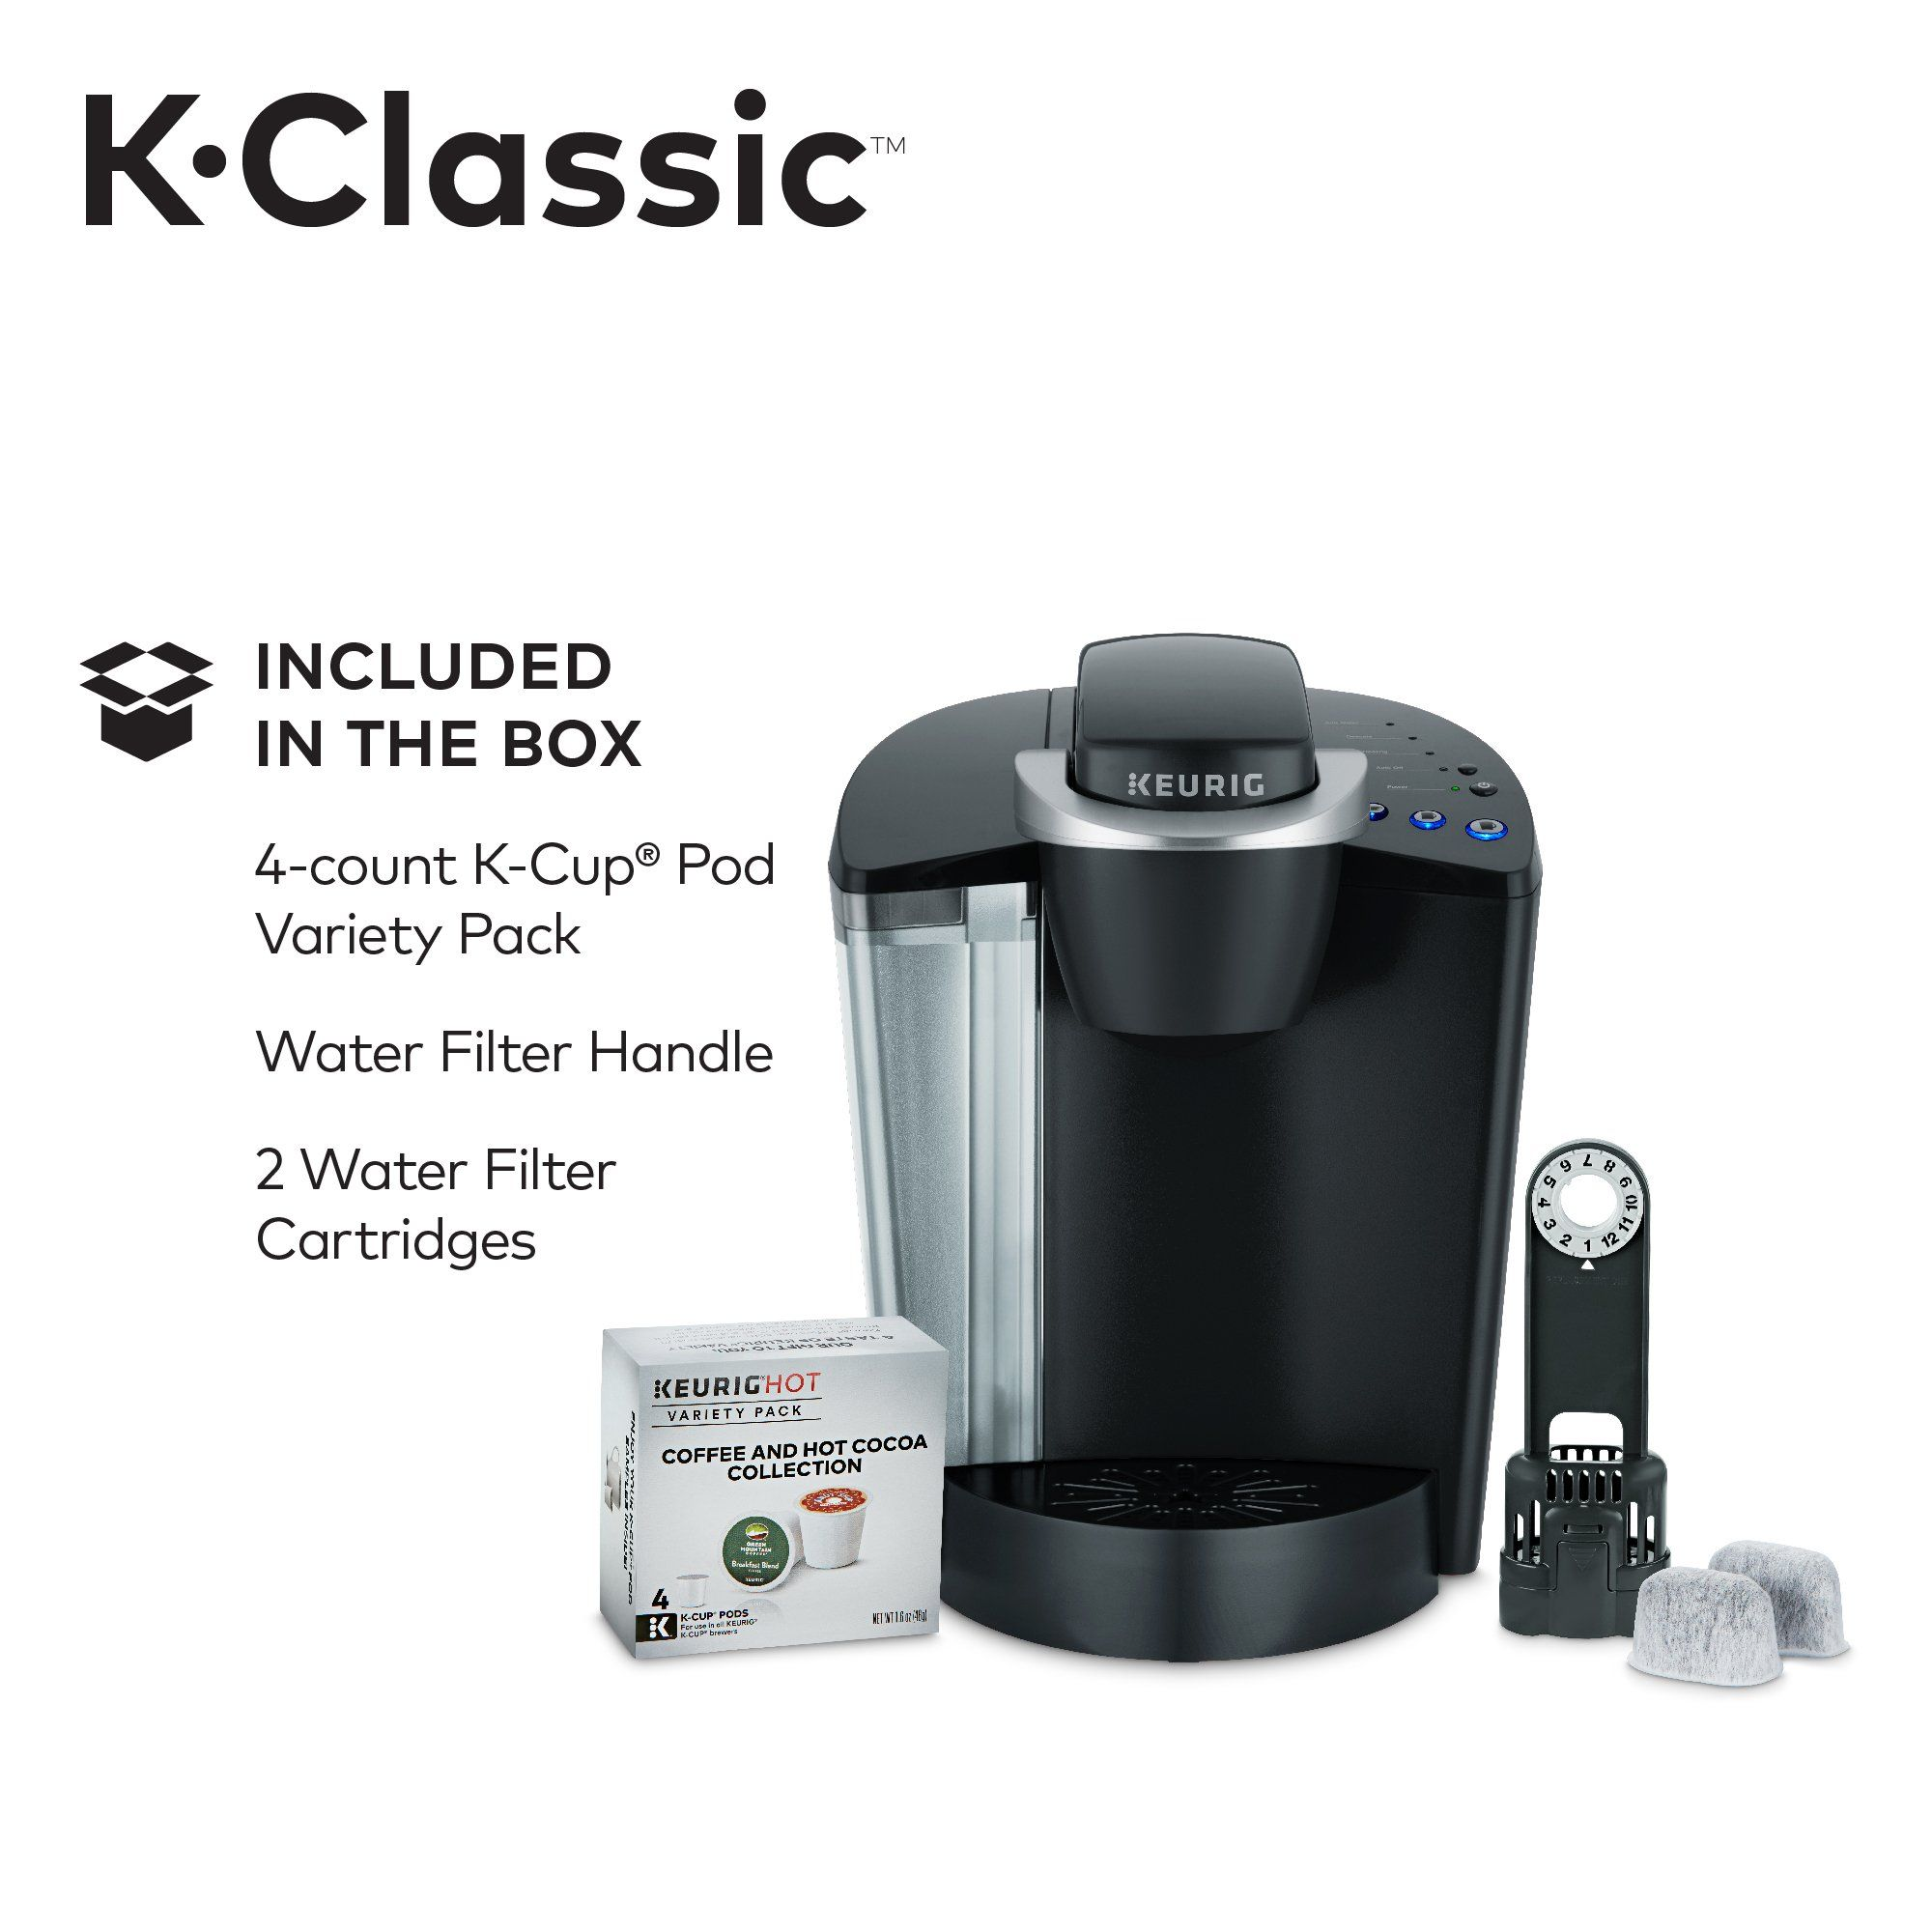 Keurig K55/KClassic Coffee Maker KCup Pod Single Serve